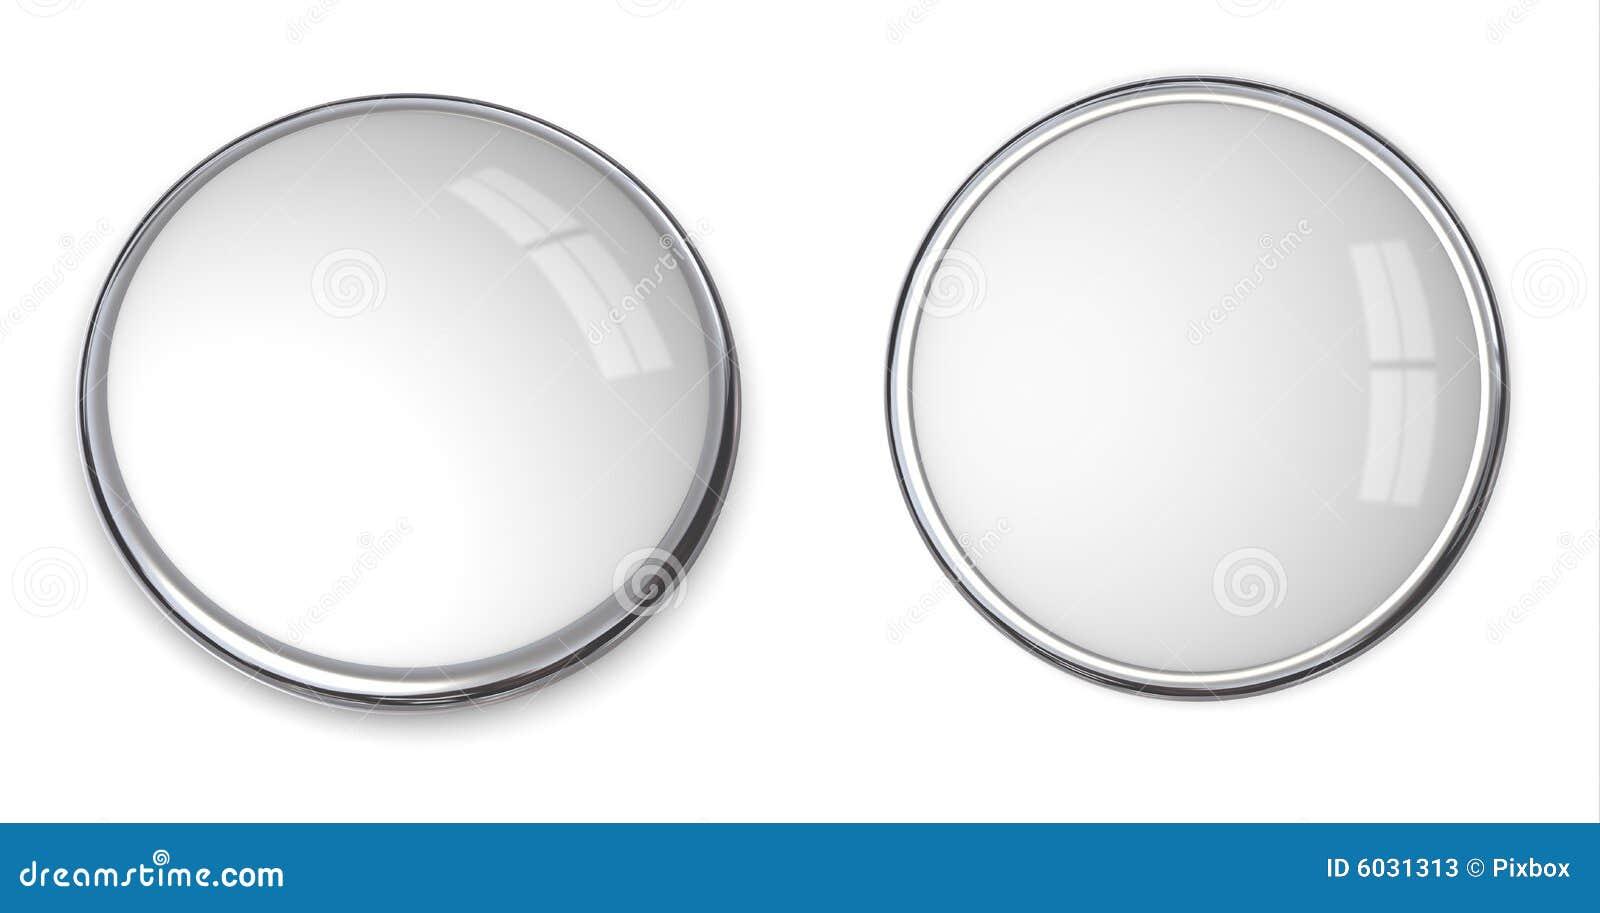 design a button template free - 3d button template 2 views stock photos image 6031313